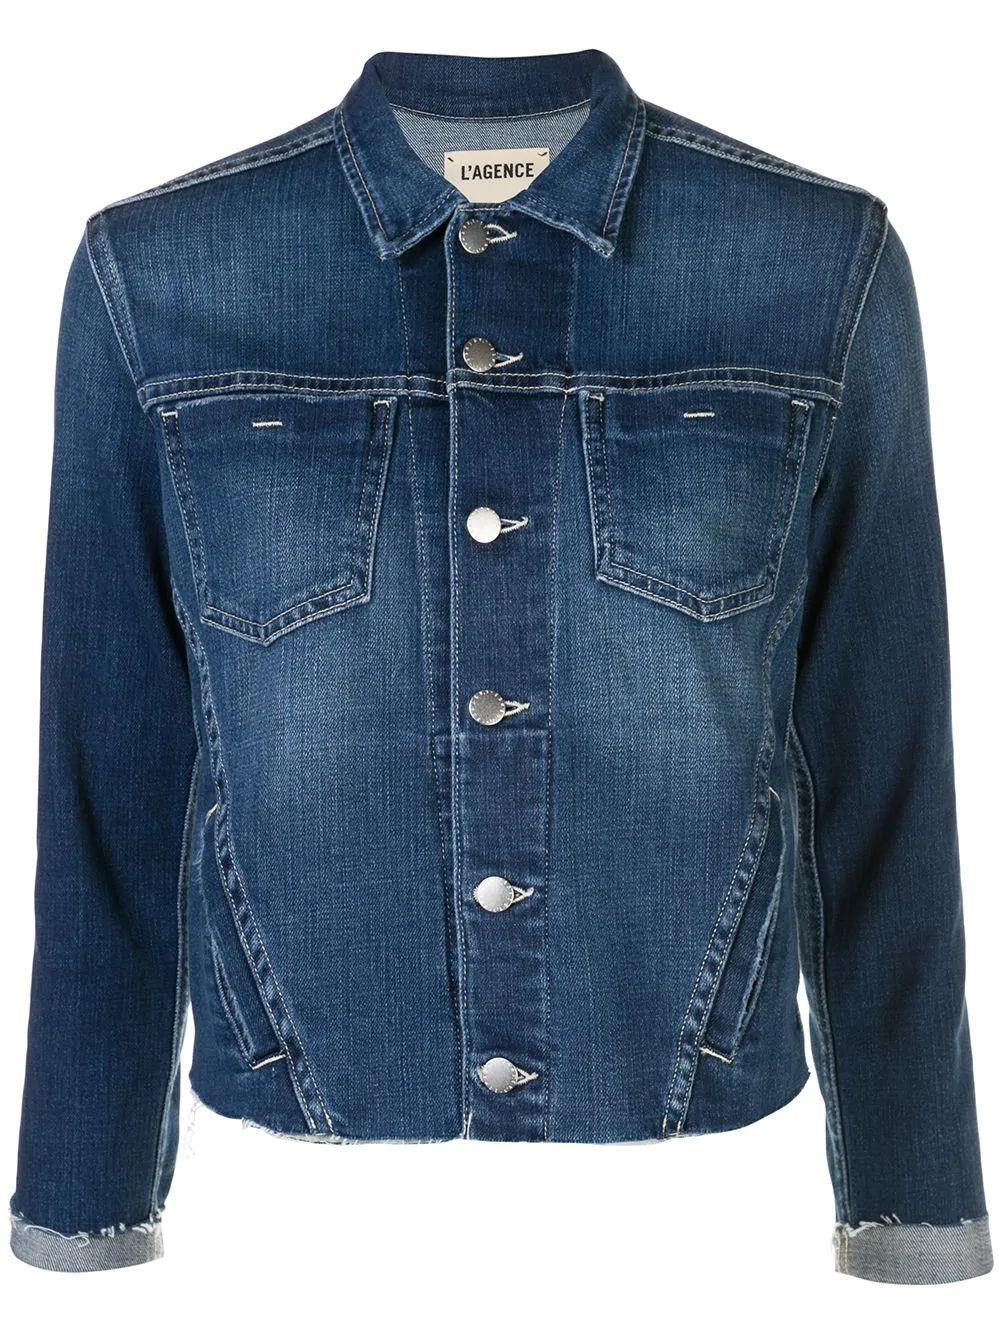 Janelle Slim Raw Hem Jacket Item # 1431RDM